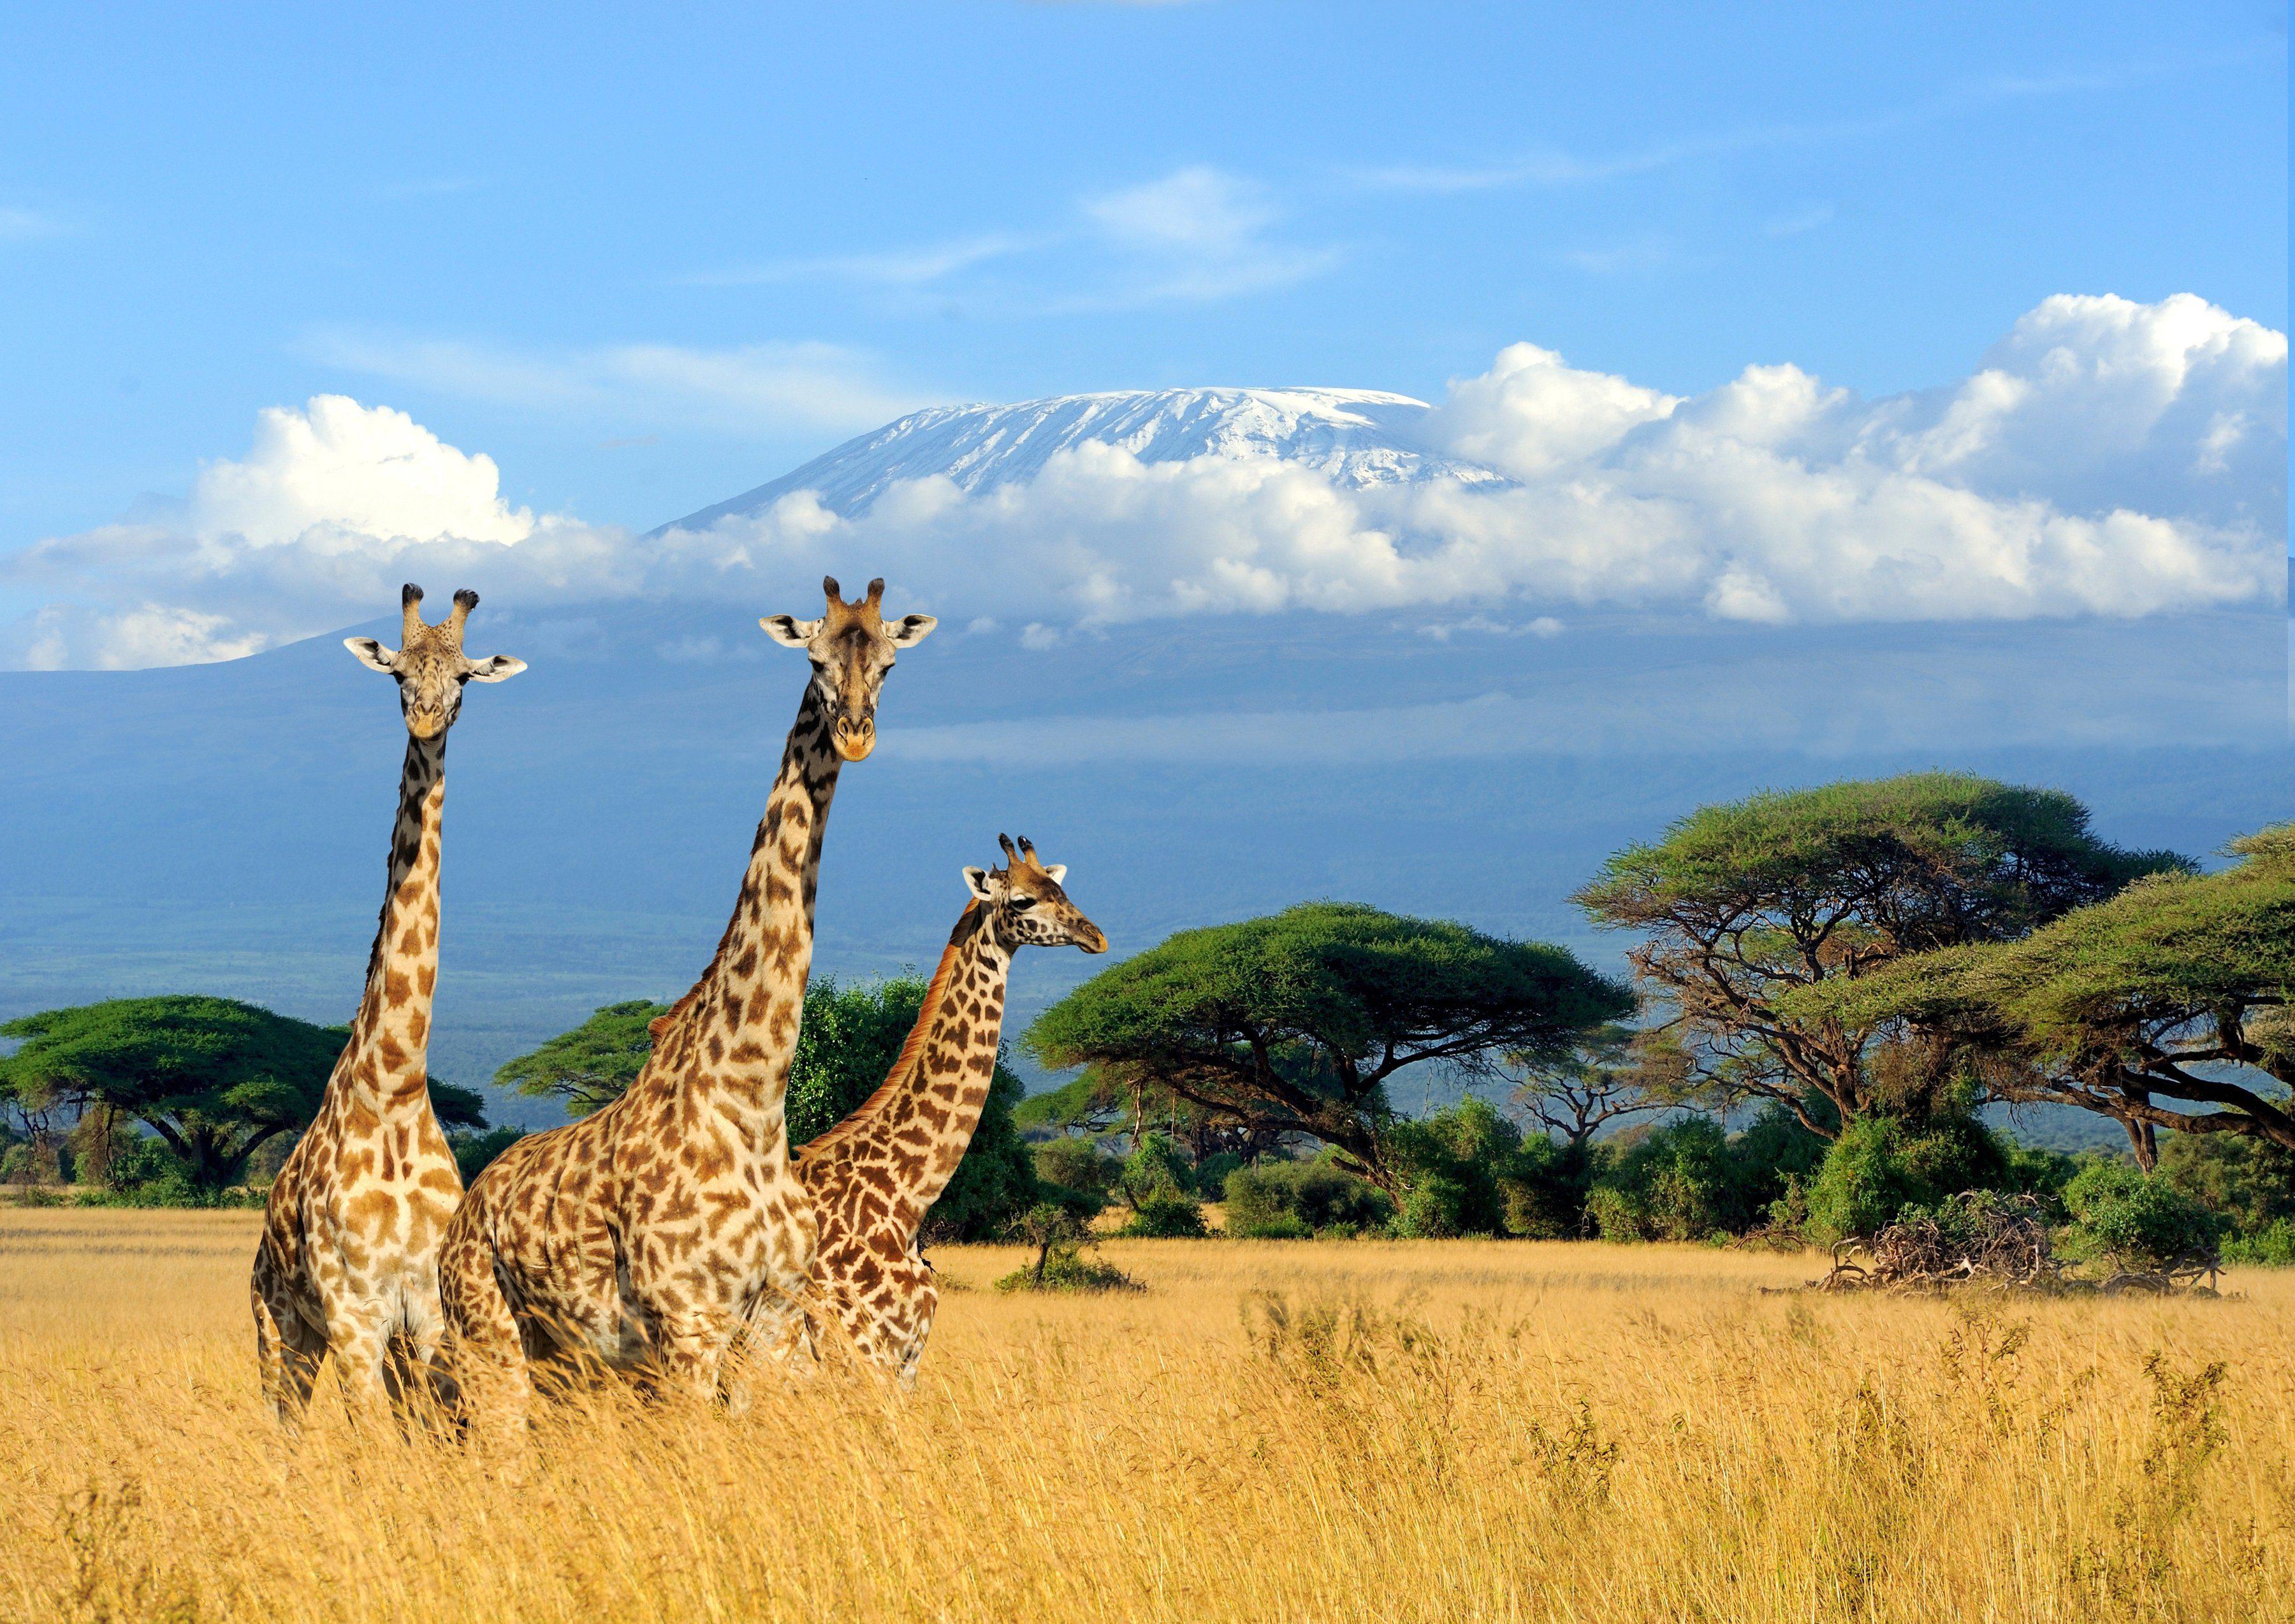 PAPERMOON Fototapete »Giraffes at Kilimanjaro«, BlueBack, 7 Bahnen, 350 x 260 cm